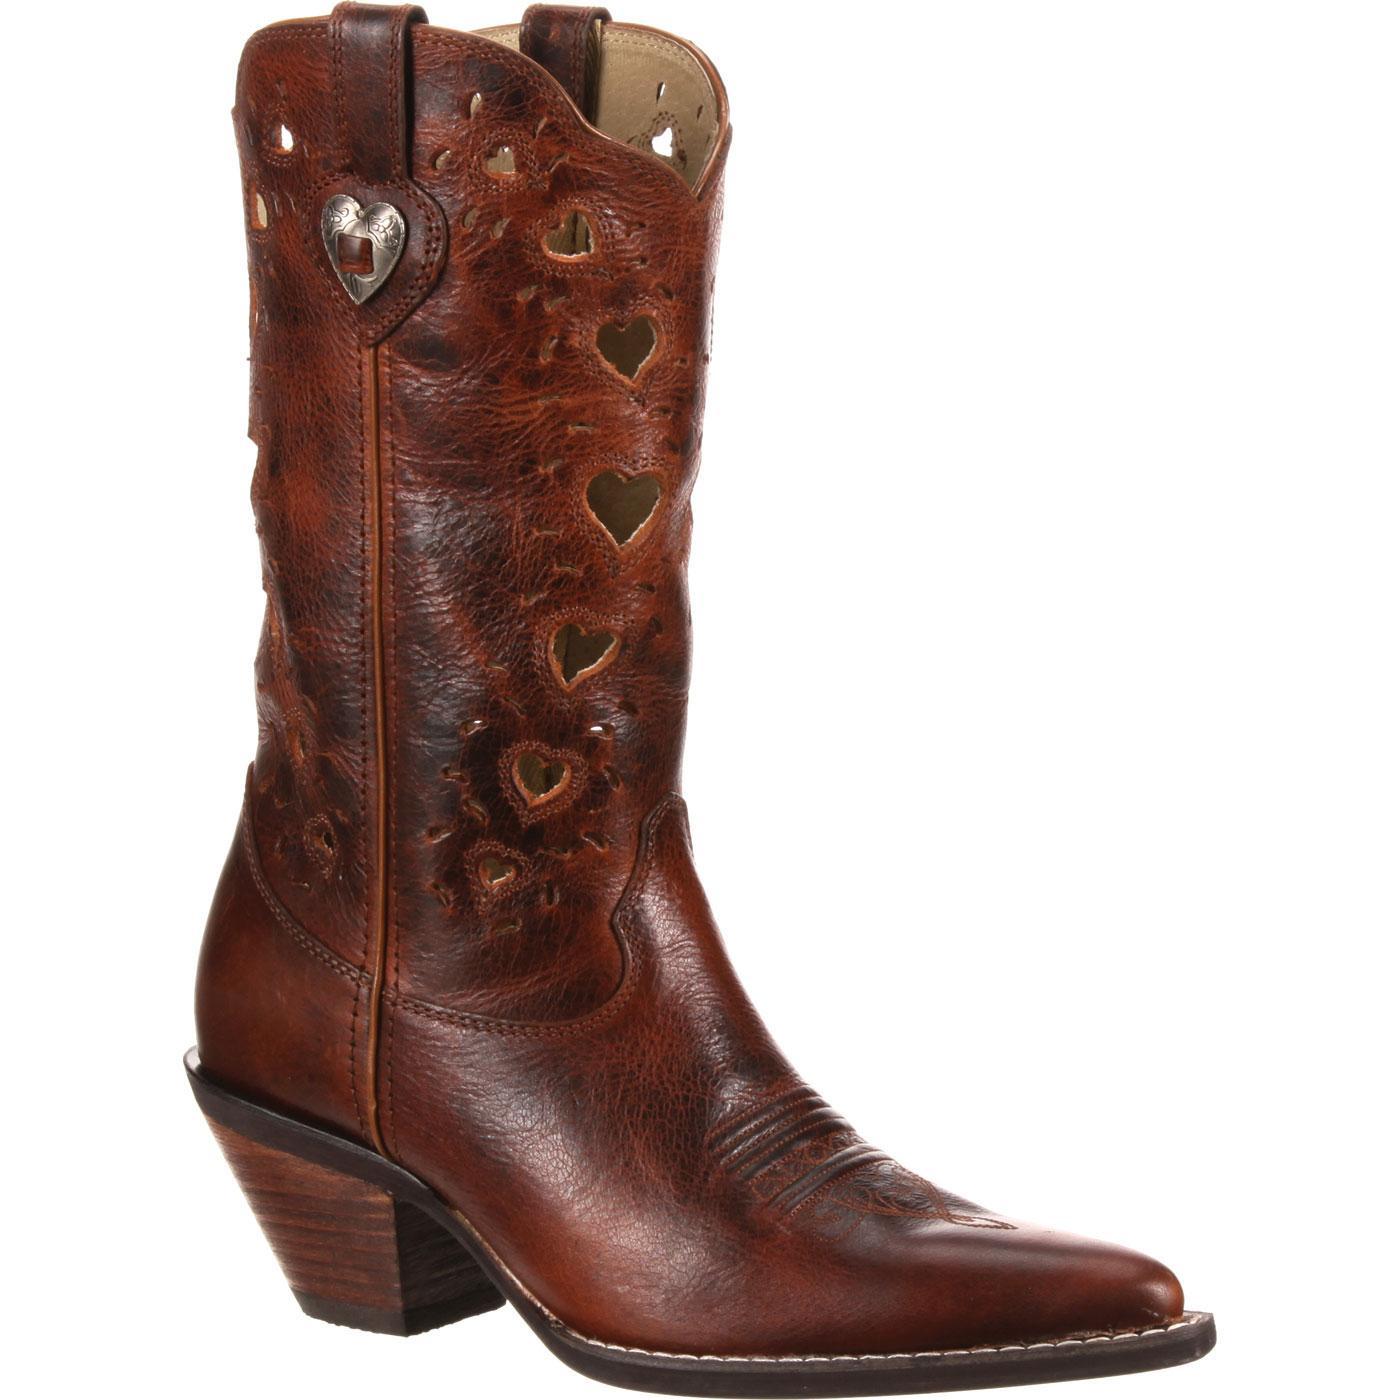 Elegant Lady Rebel By Durango Womens Steel Toe Boots